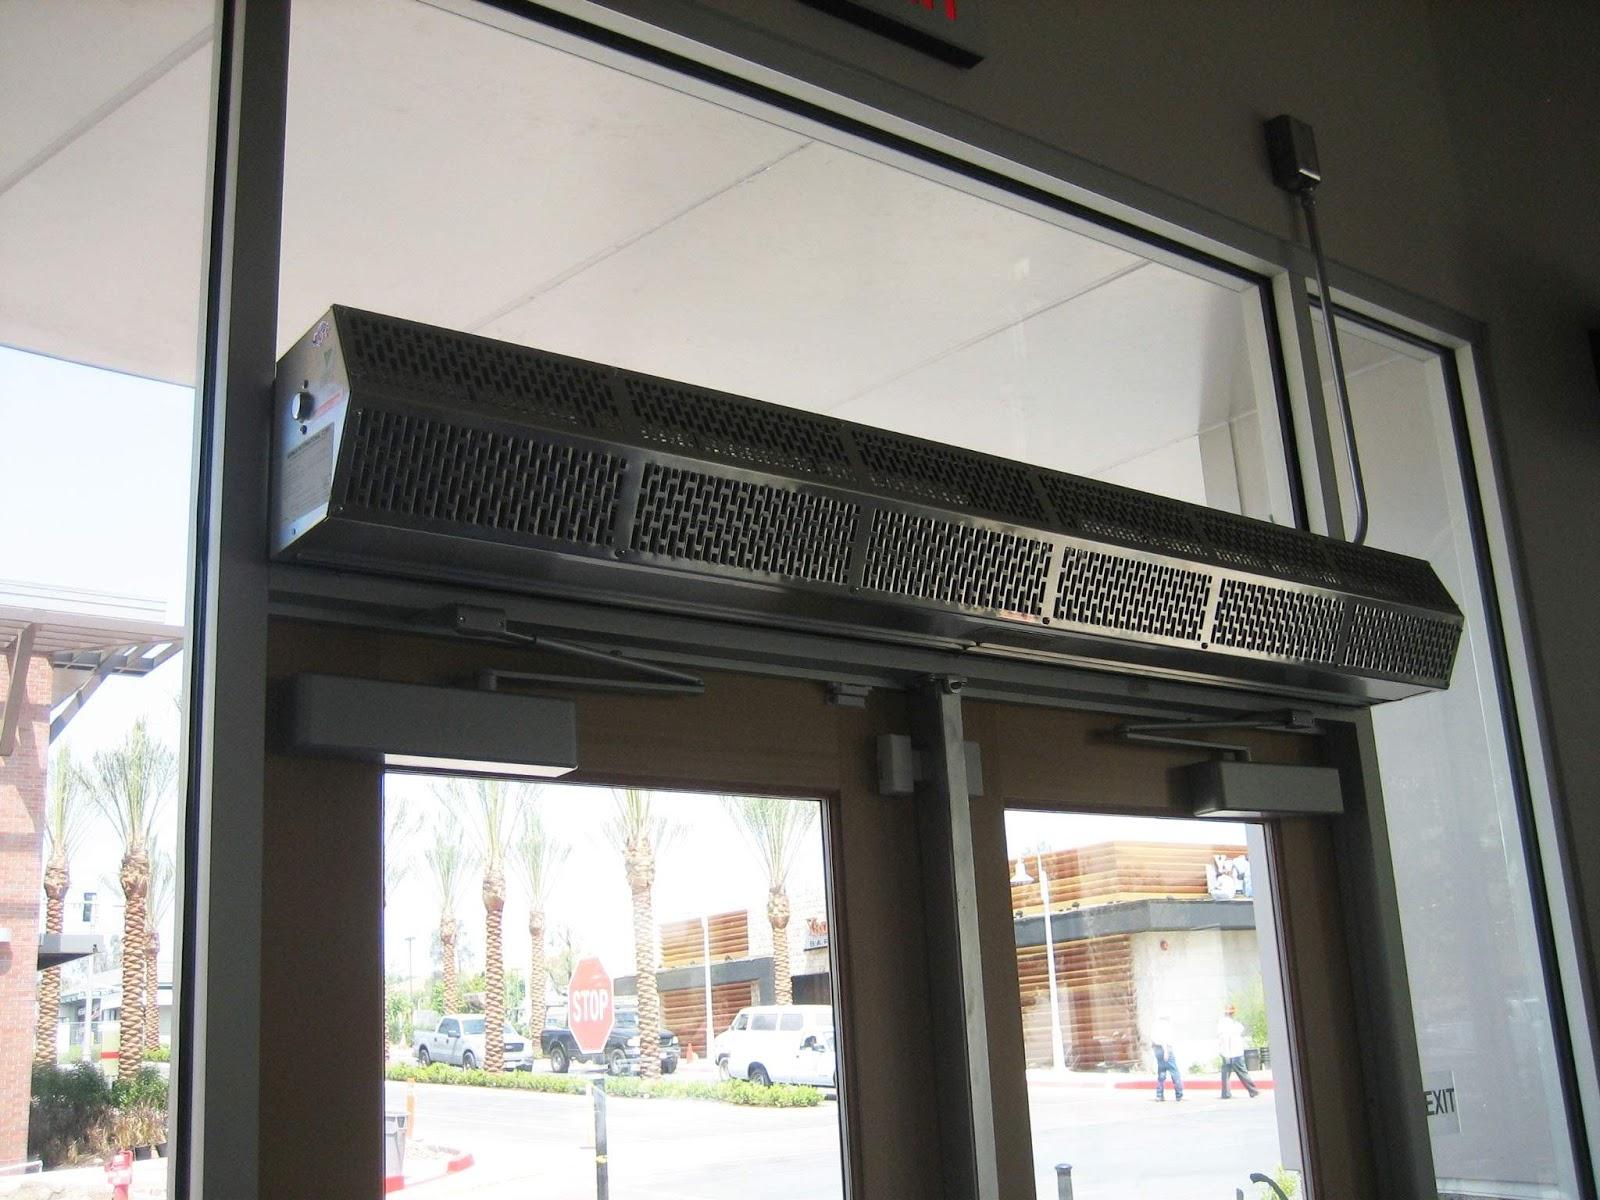 series soozone air switch door kajamm and indoor curtain control remote magnetic berner com slim w